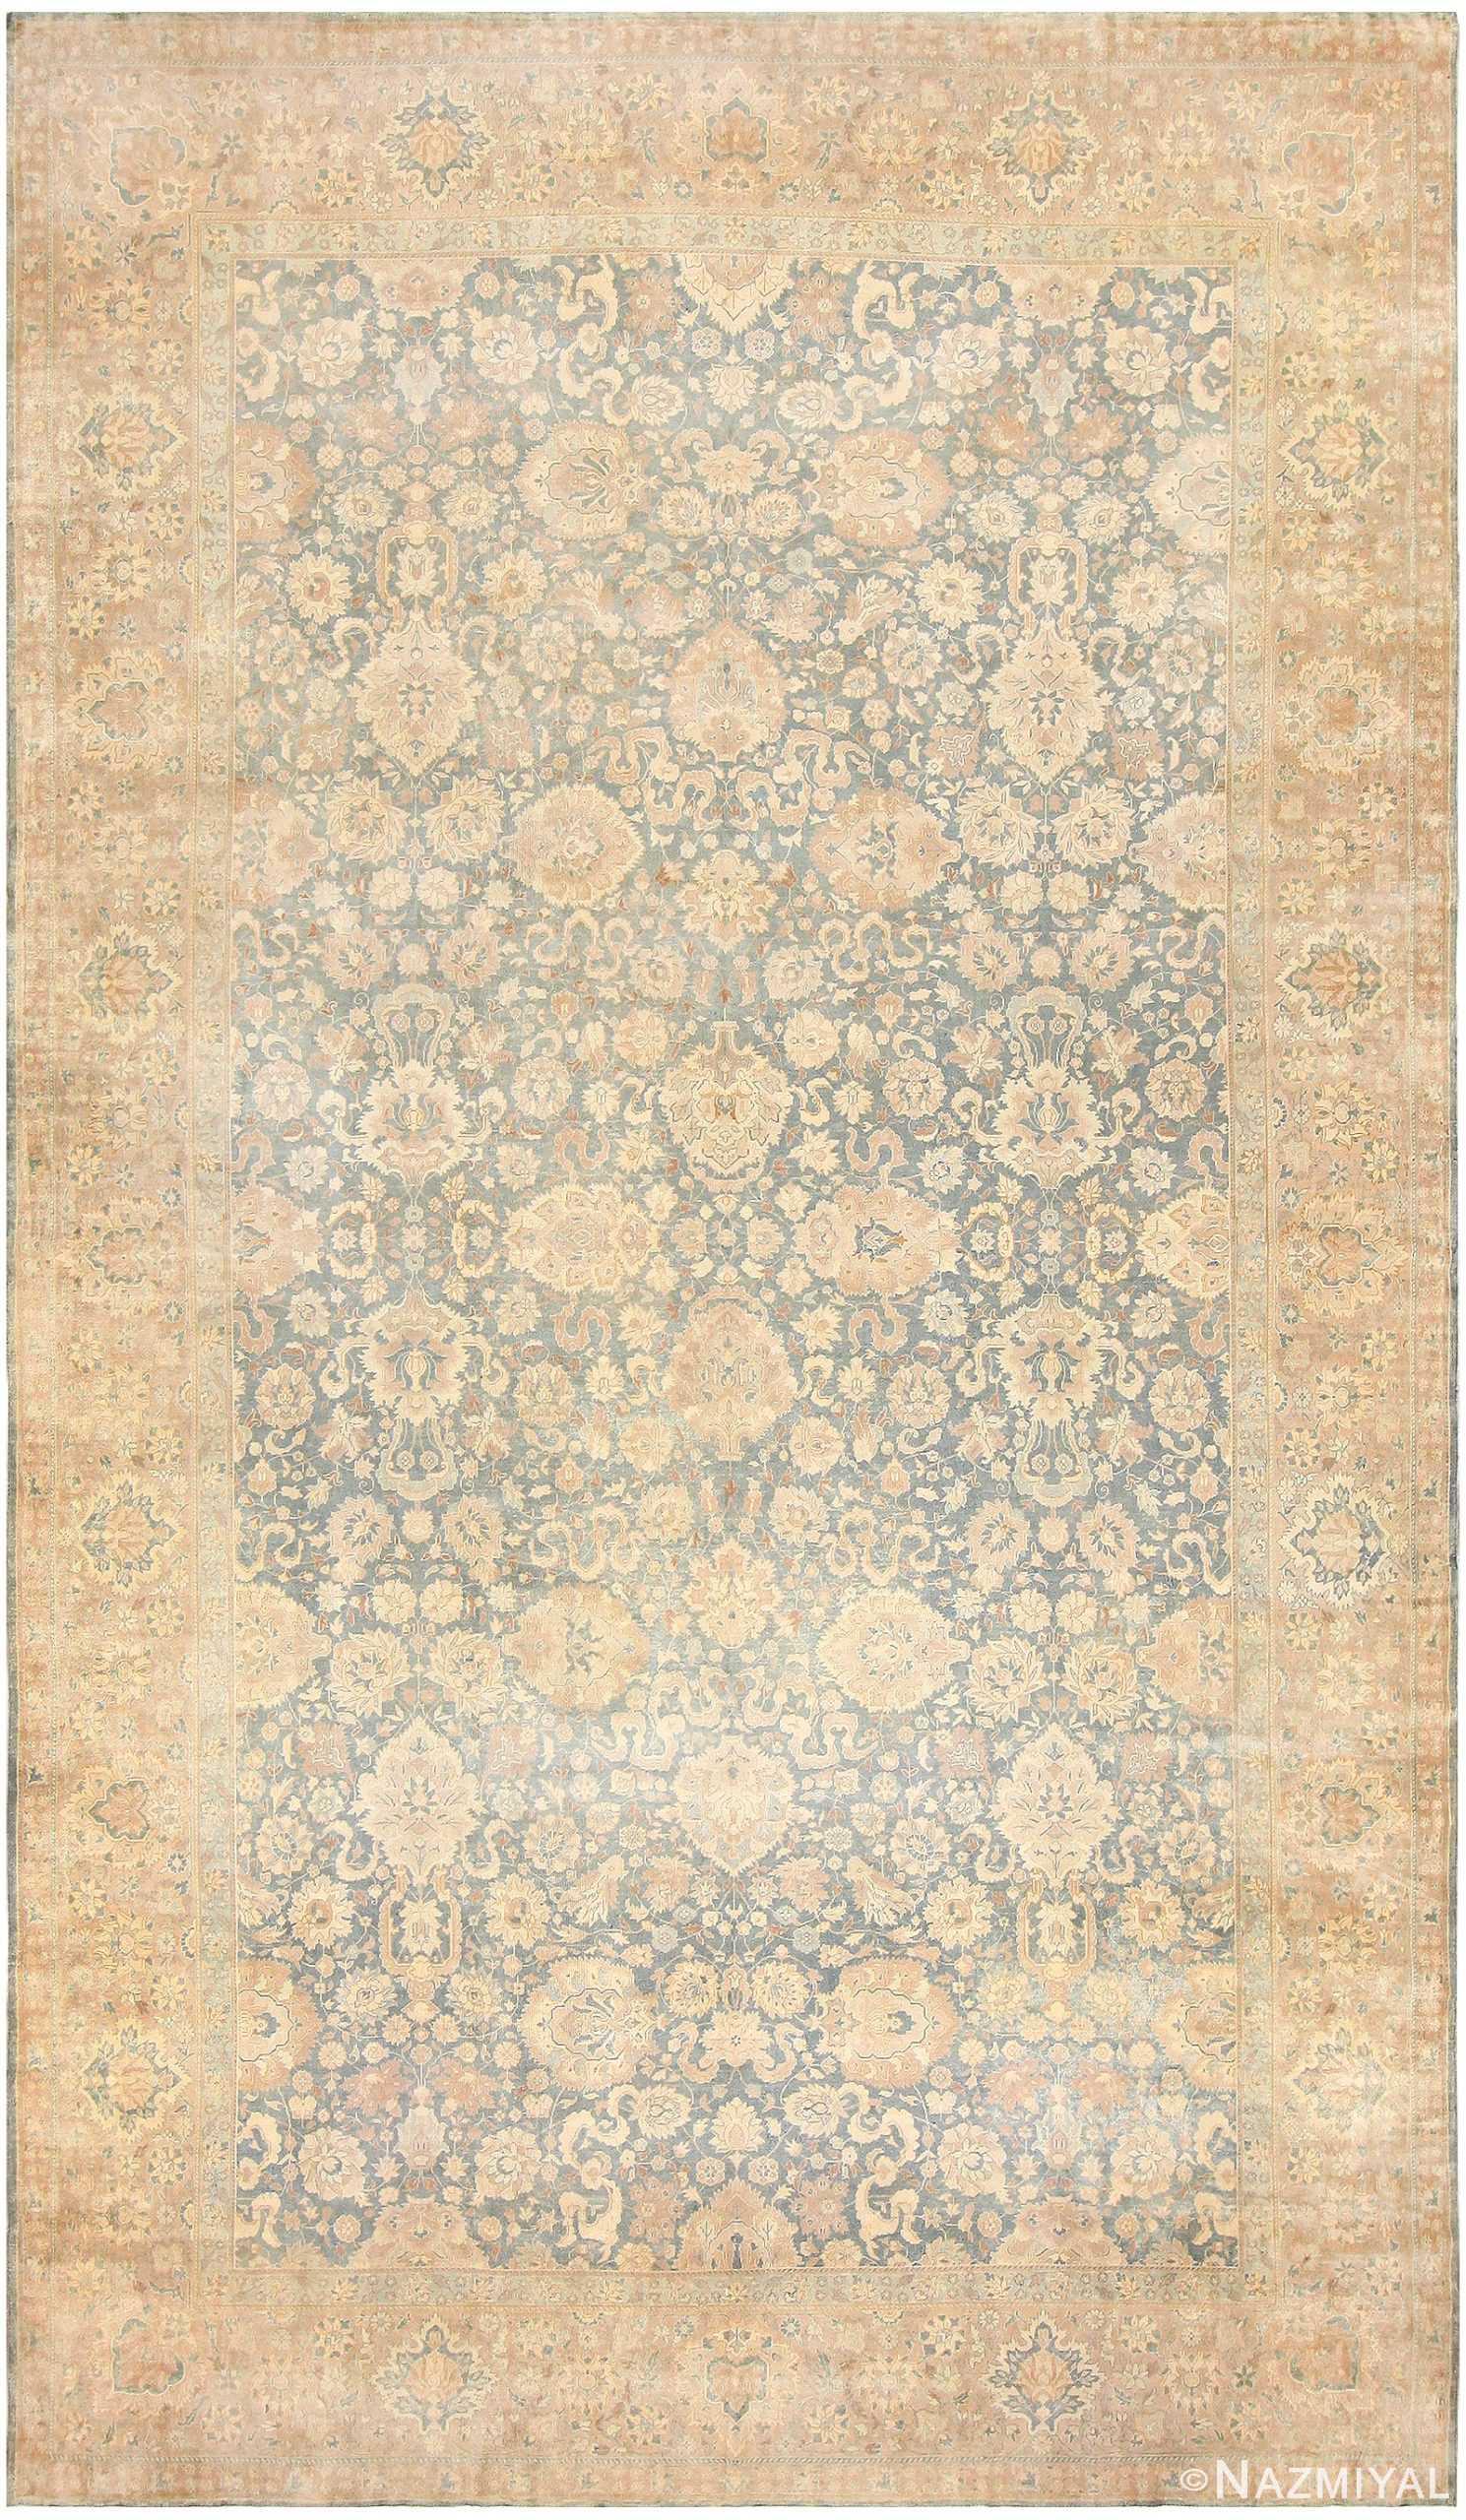 Antique Floral Indian Rug 47602 Detail/Large View